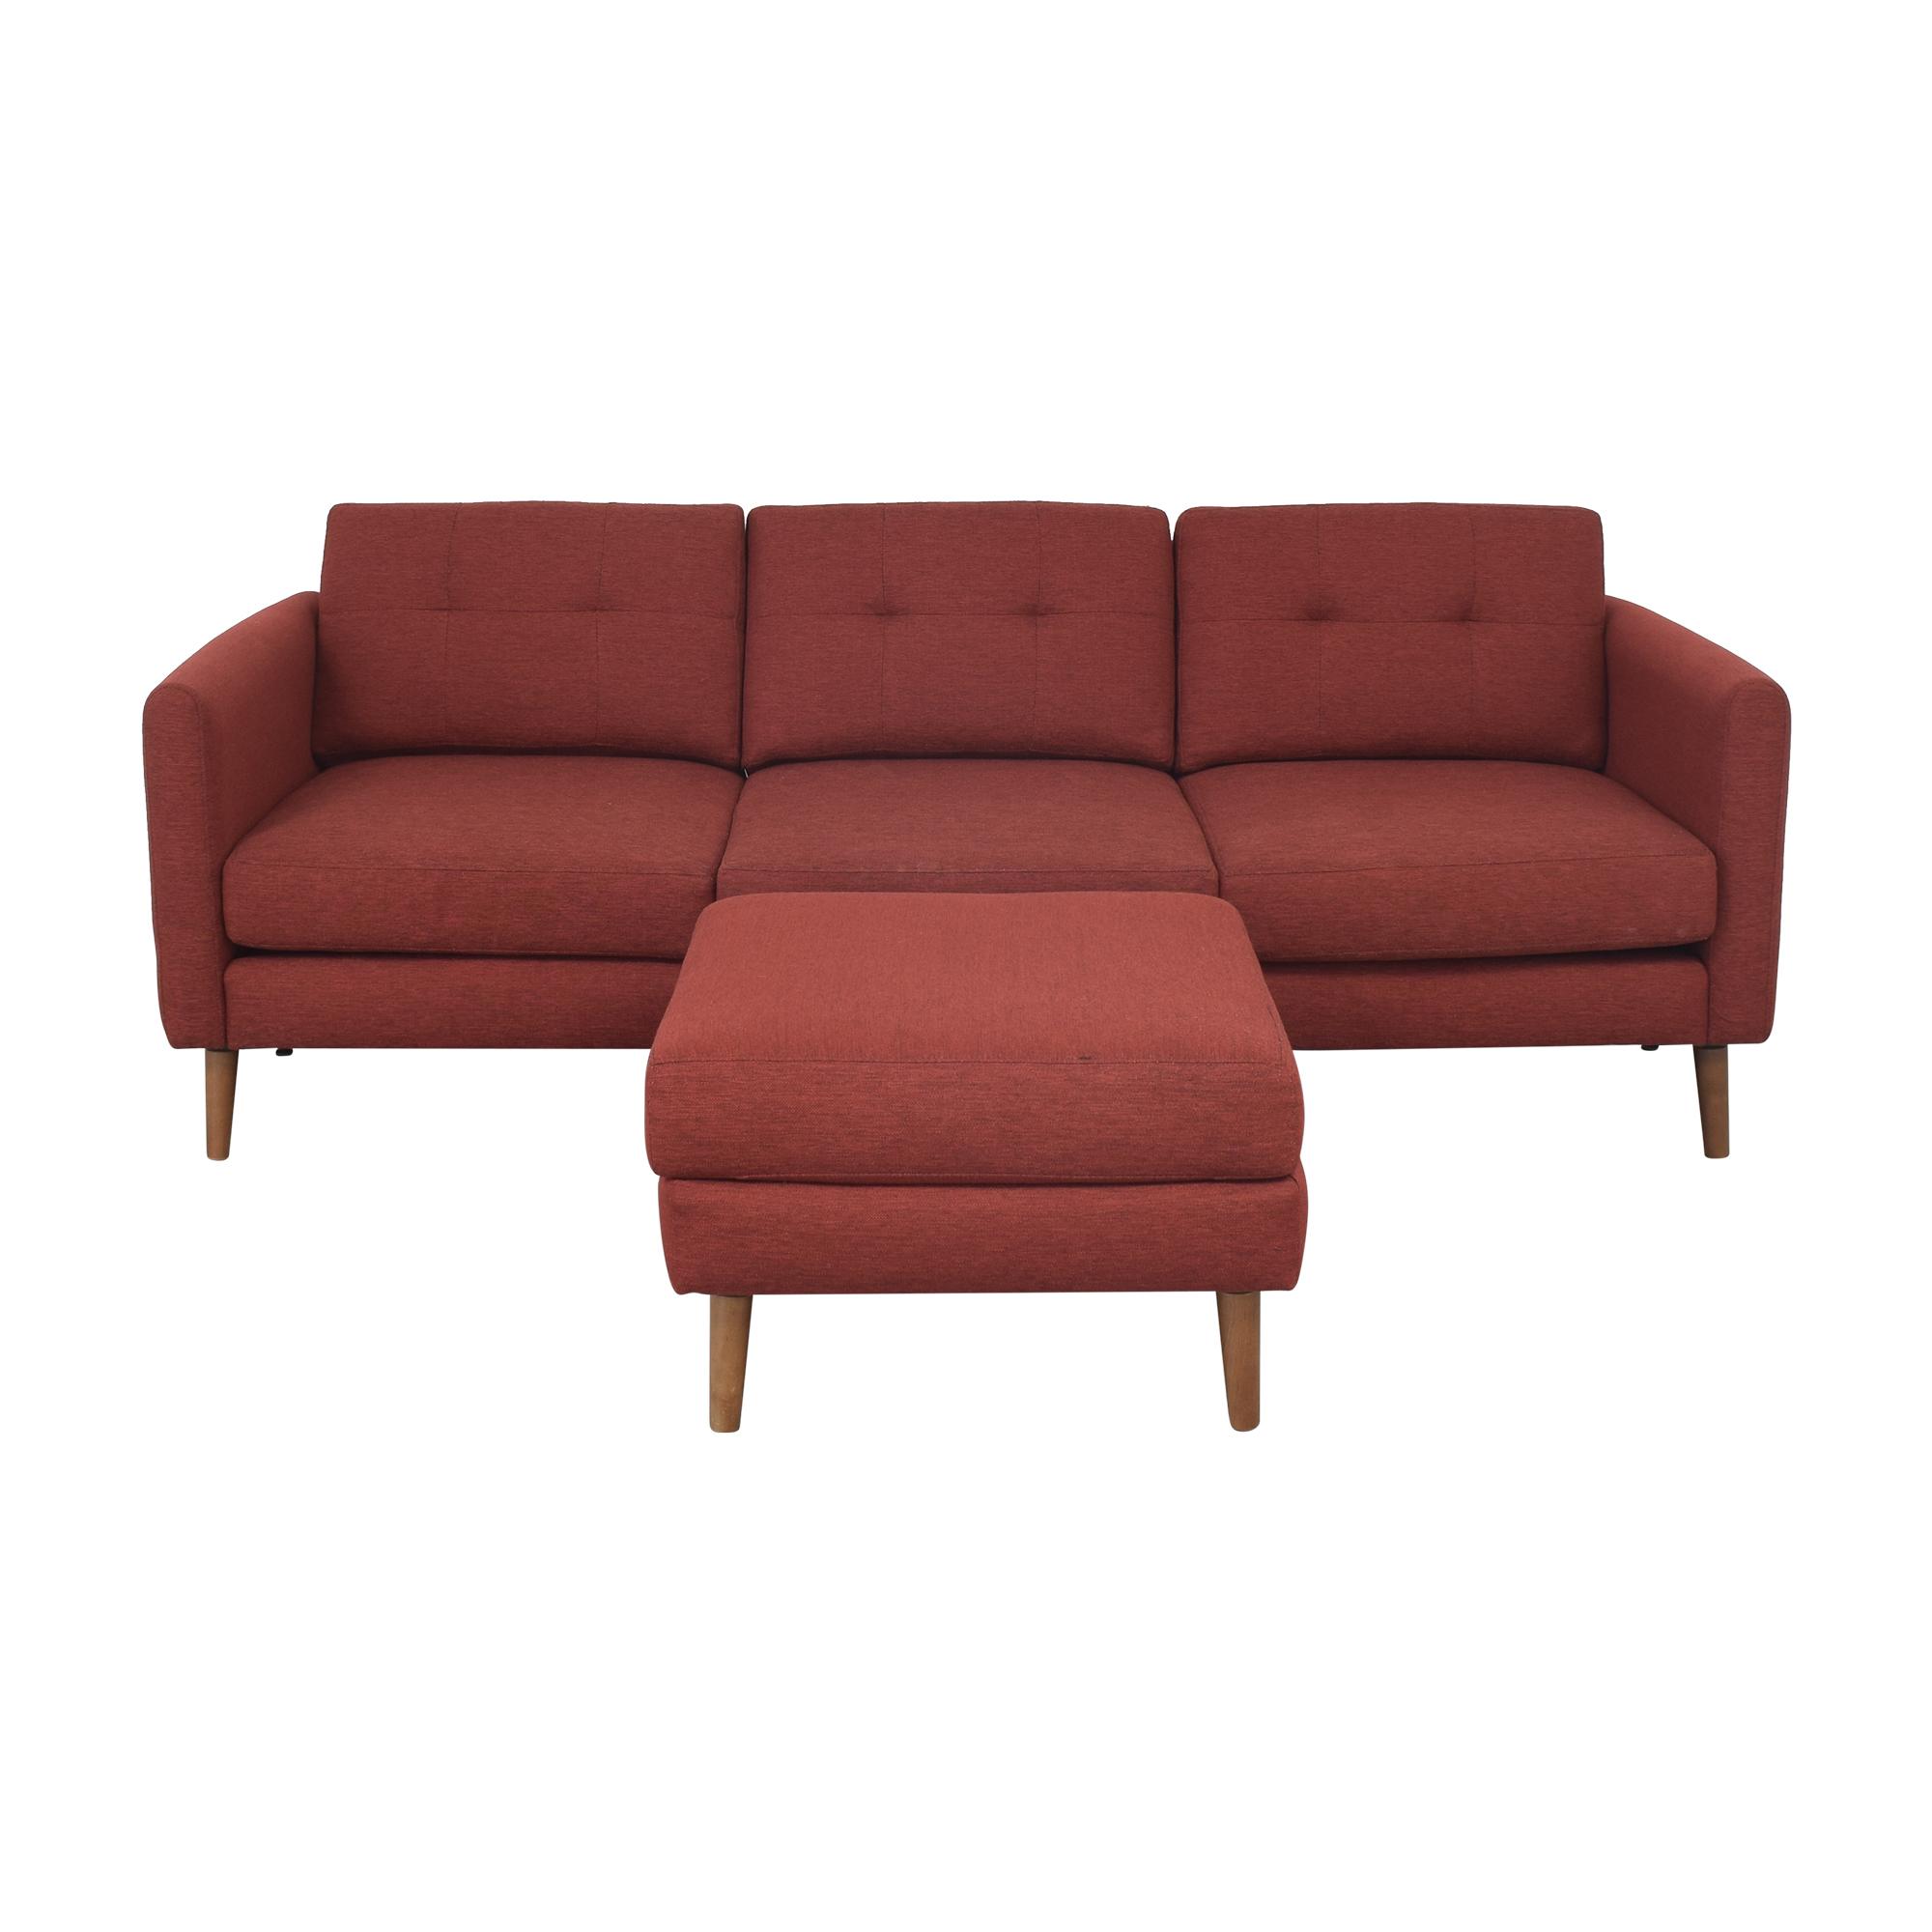 Burrow Burrow Block Nomad Sofa with Ottoman second hand